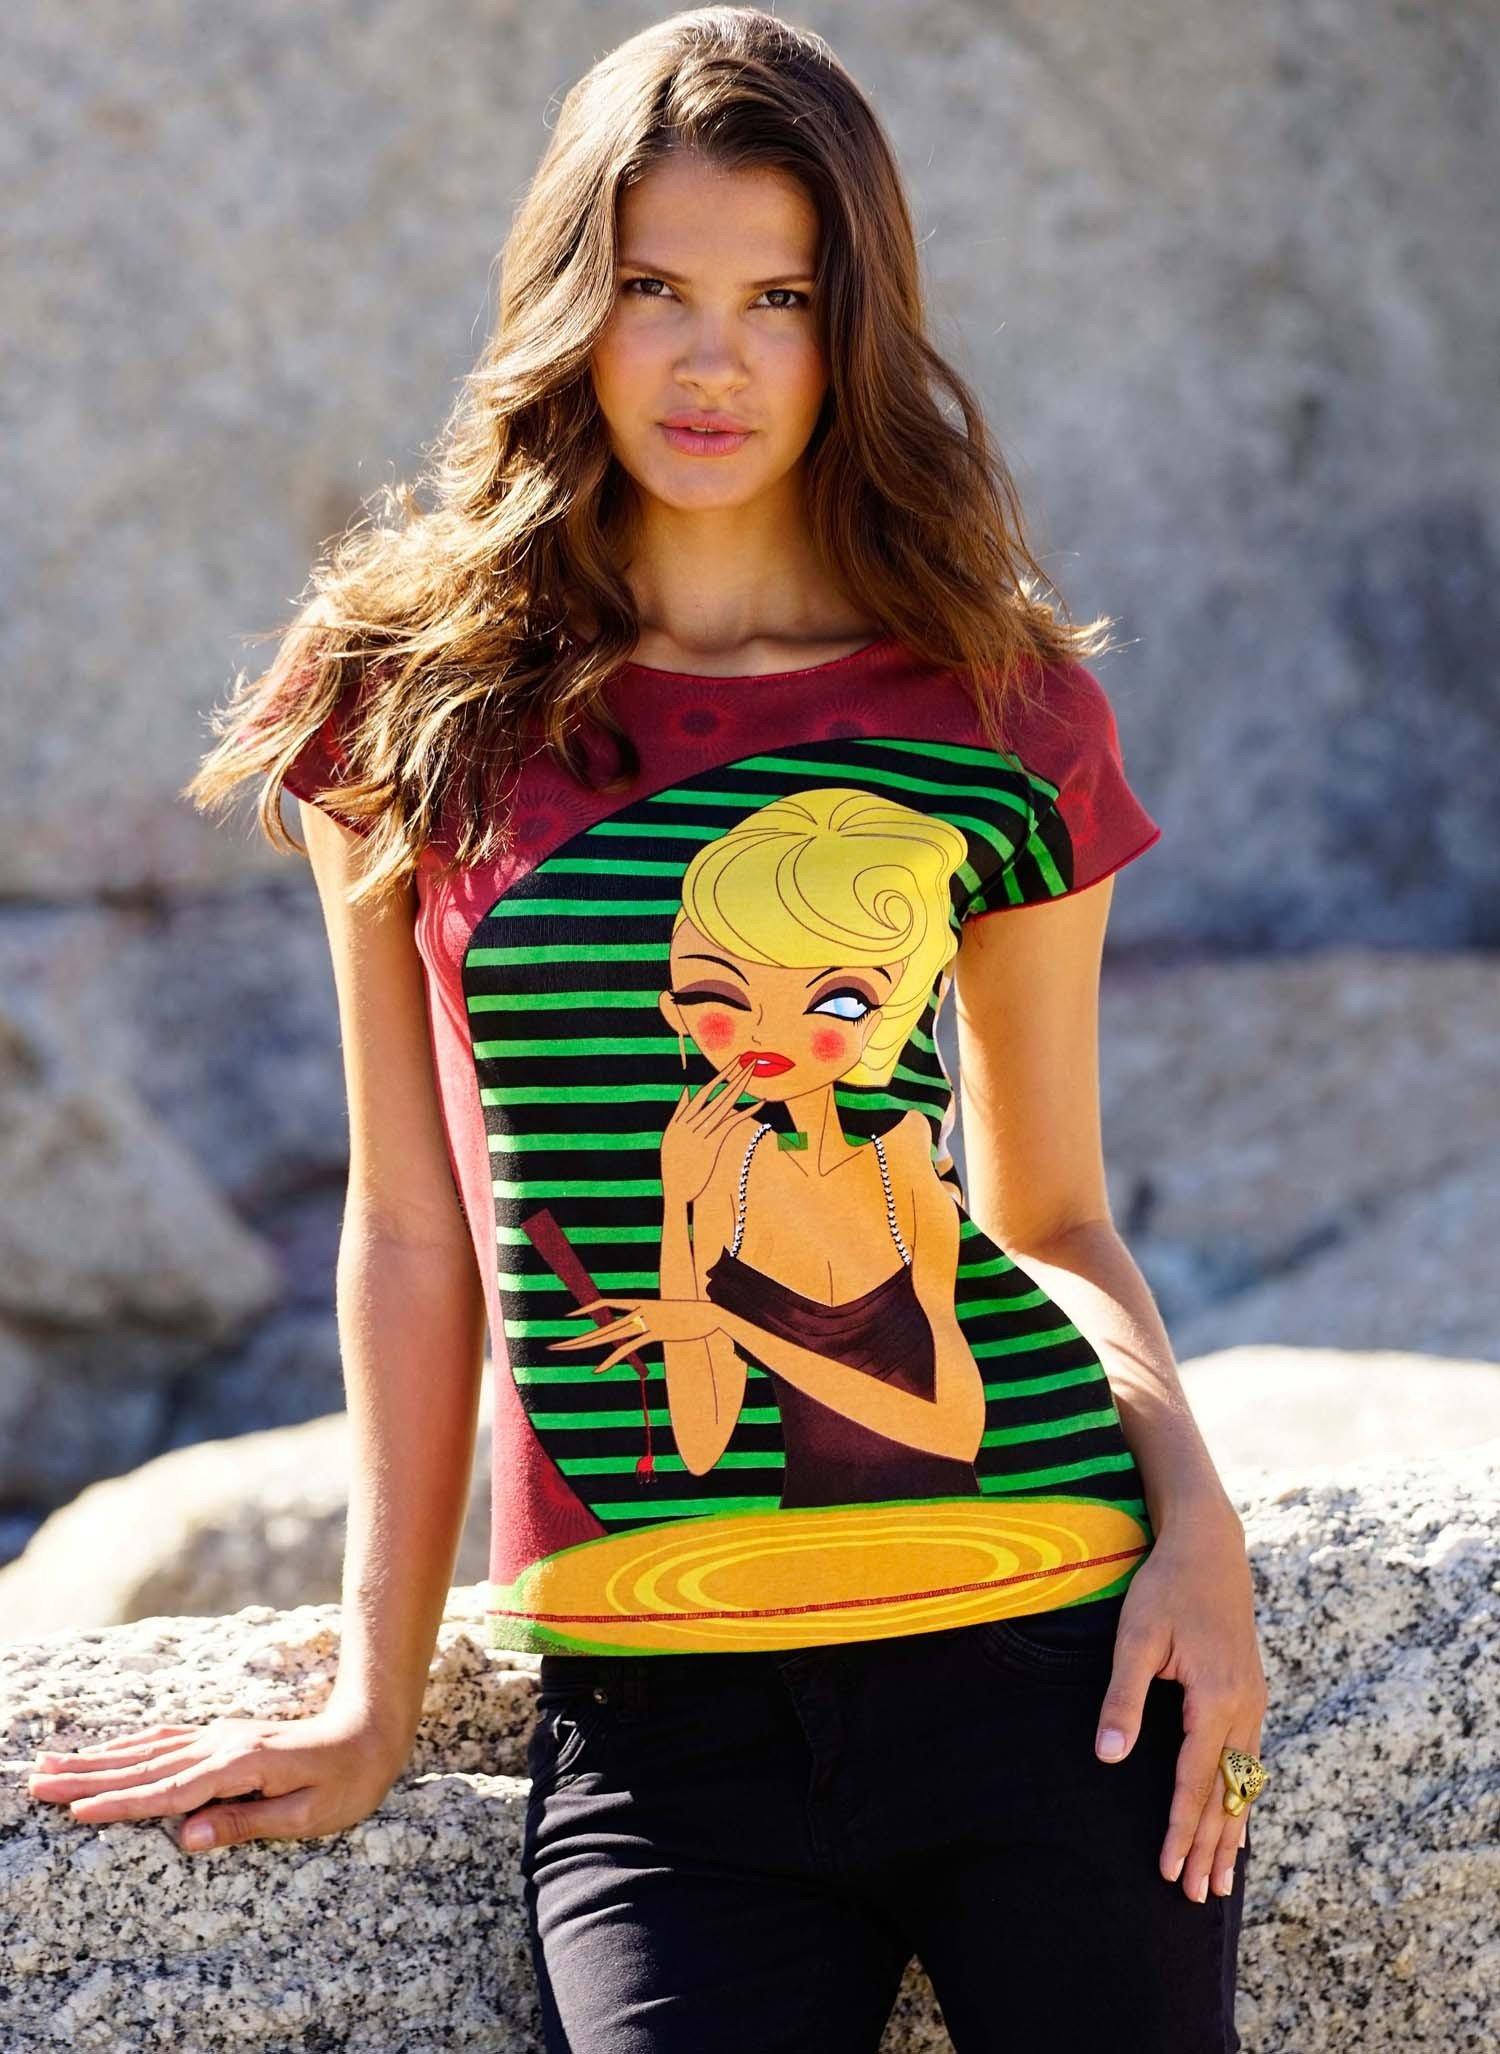 D-KA-Shirt,Blondine Multicolor L 058 - 1 - Ronja.ch